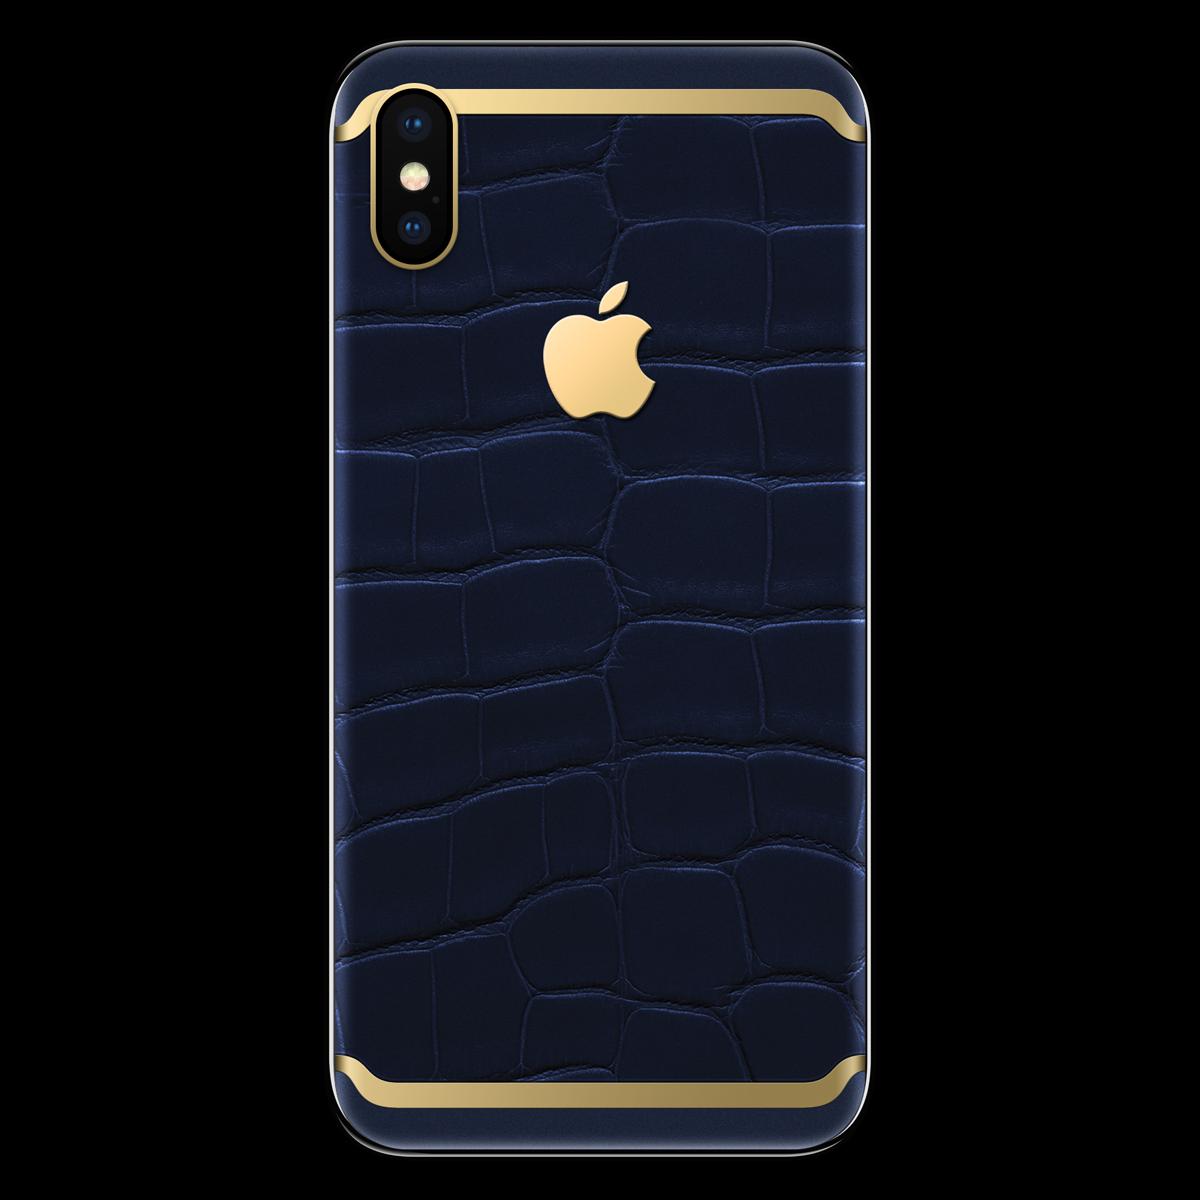 Моддинг iPhone X аллигатор синий с золотом